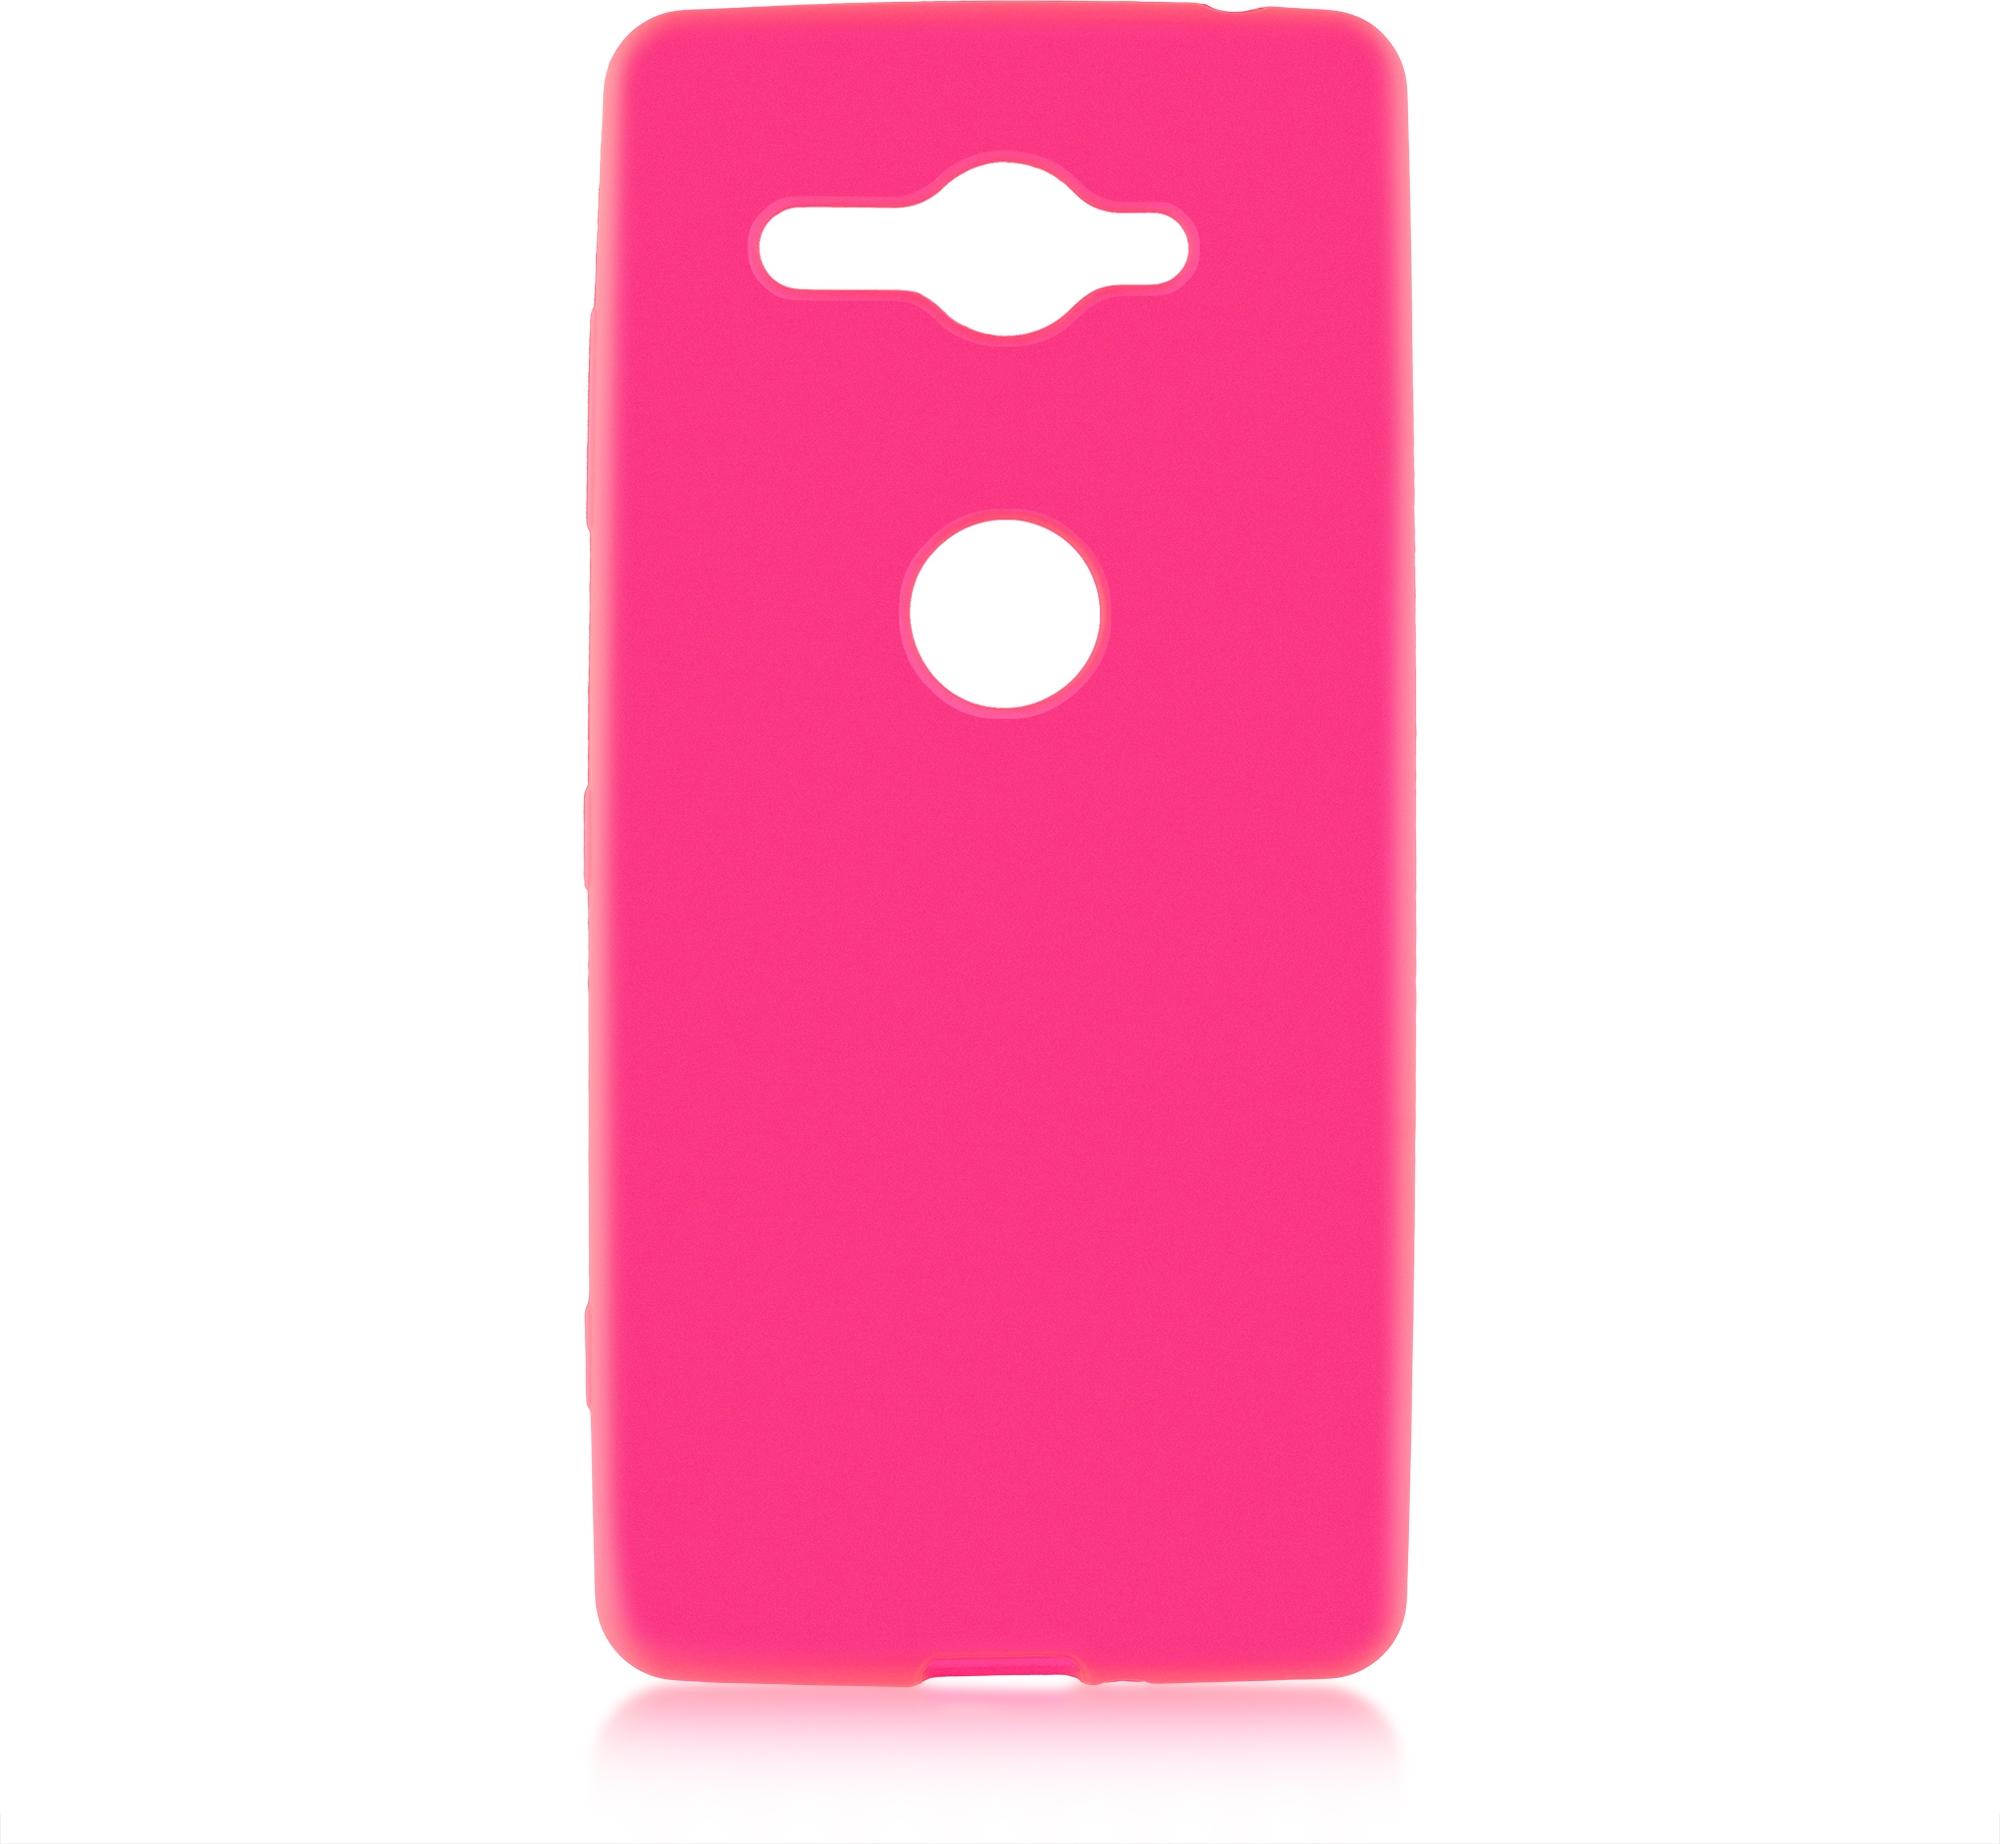 Чехол Brosco Colourful для Sony Xperia XZ2 Compact, розовый аксессуар чехол для sony xperia xz2 compact brosco transparent xz2c tpu transparent